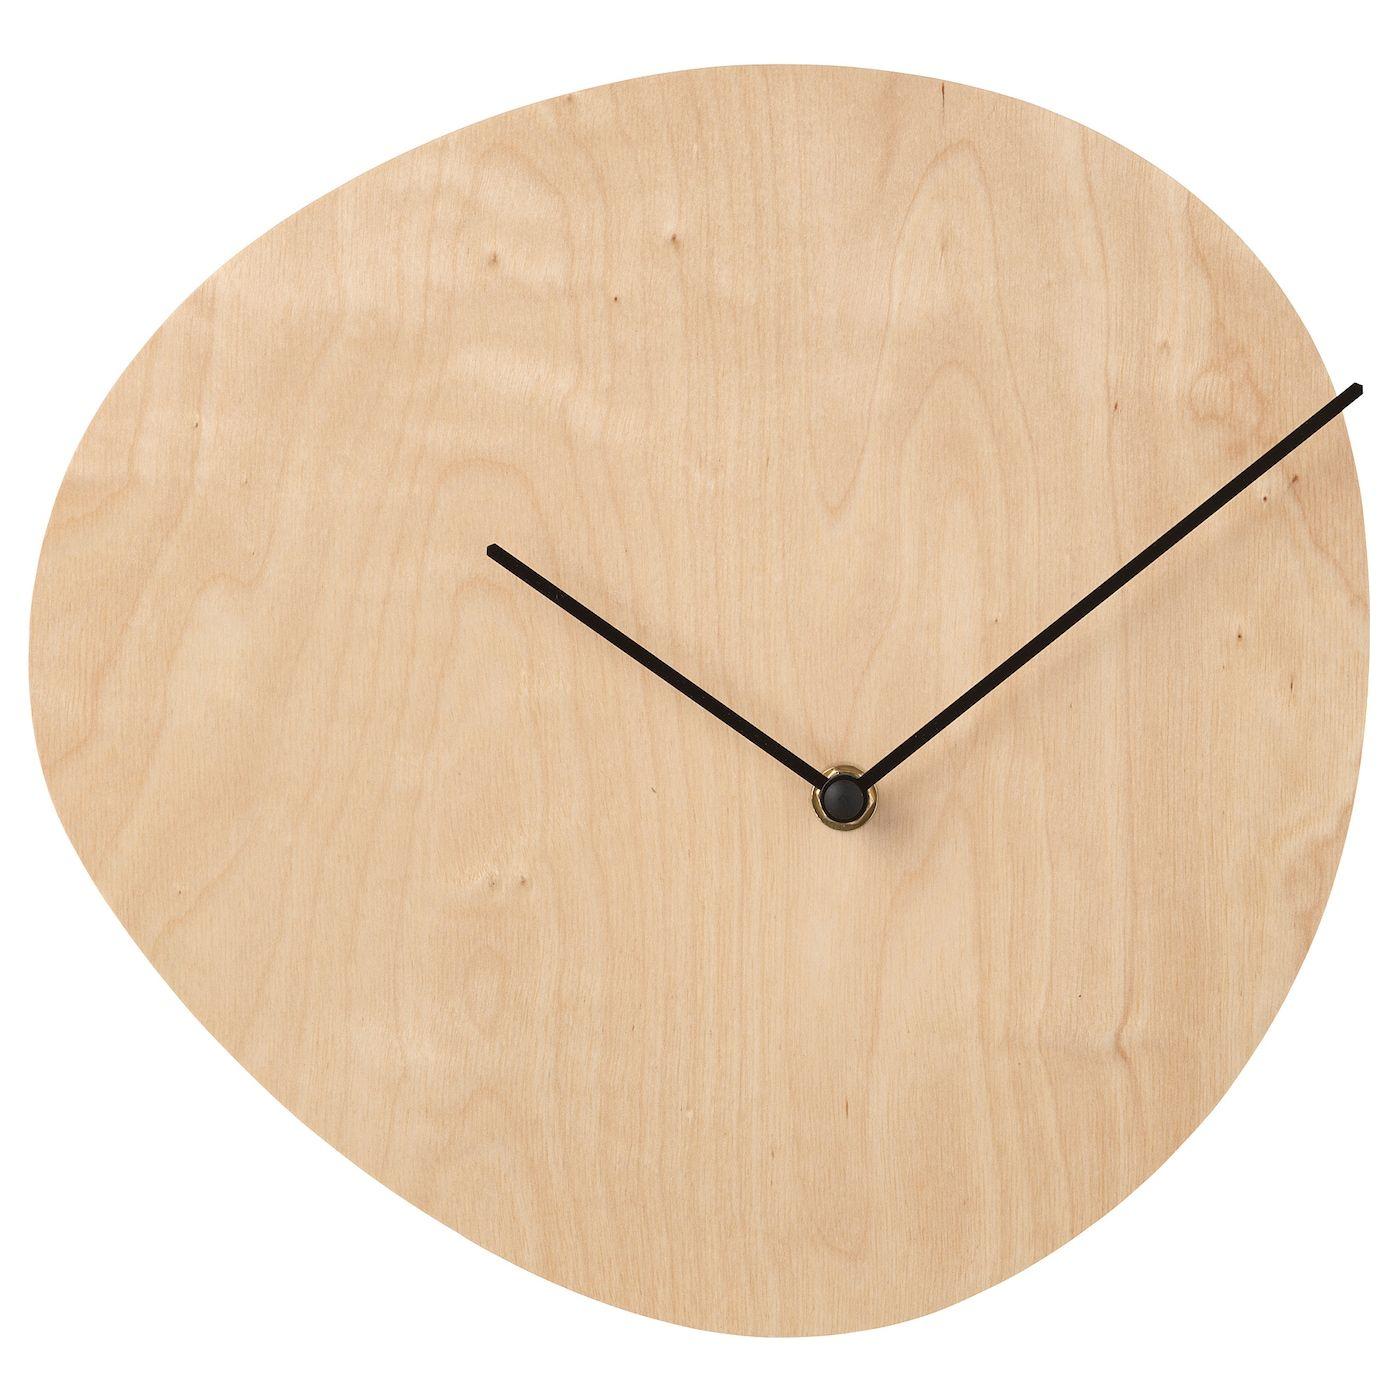 Snajdare Wall Clock Birch Plywood Ikea Wall Clock Ikea Wall Clock Design Wall Clock